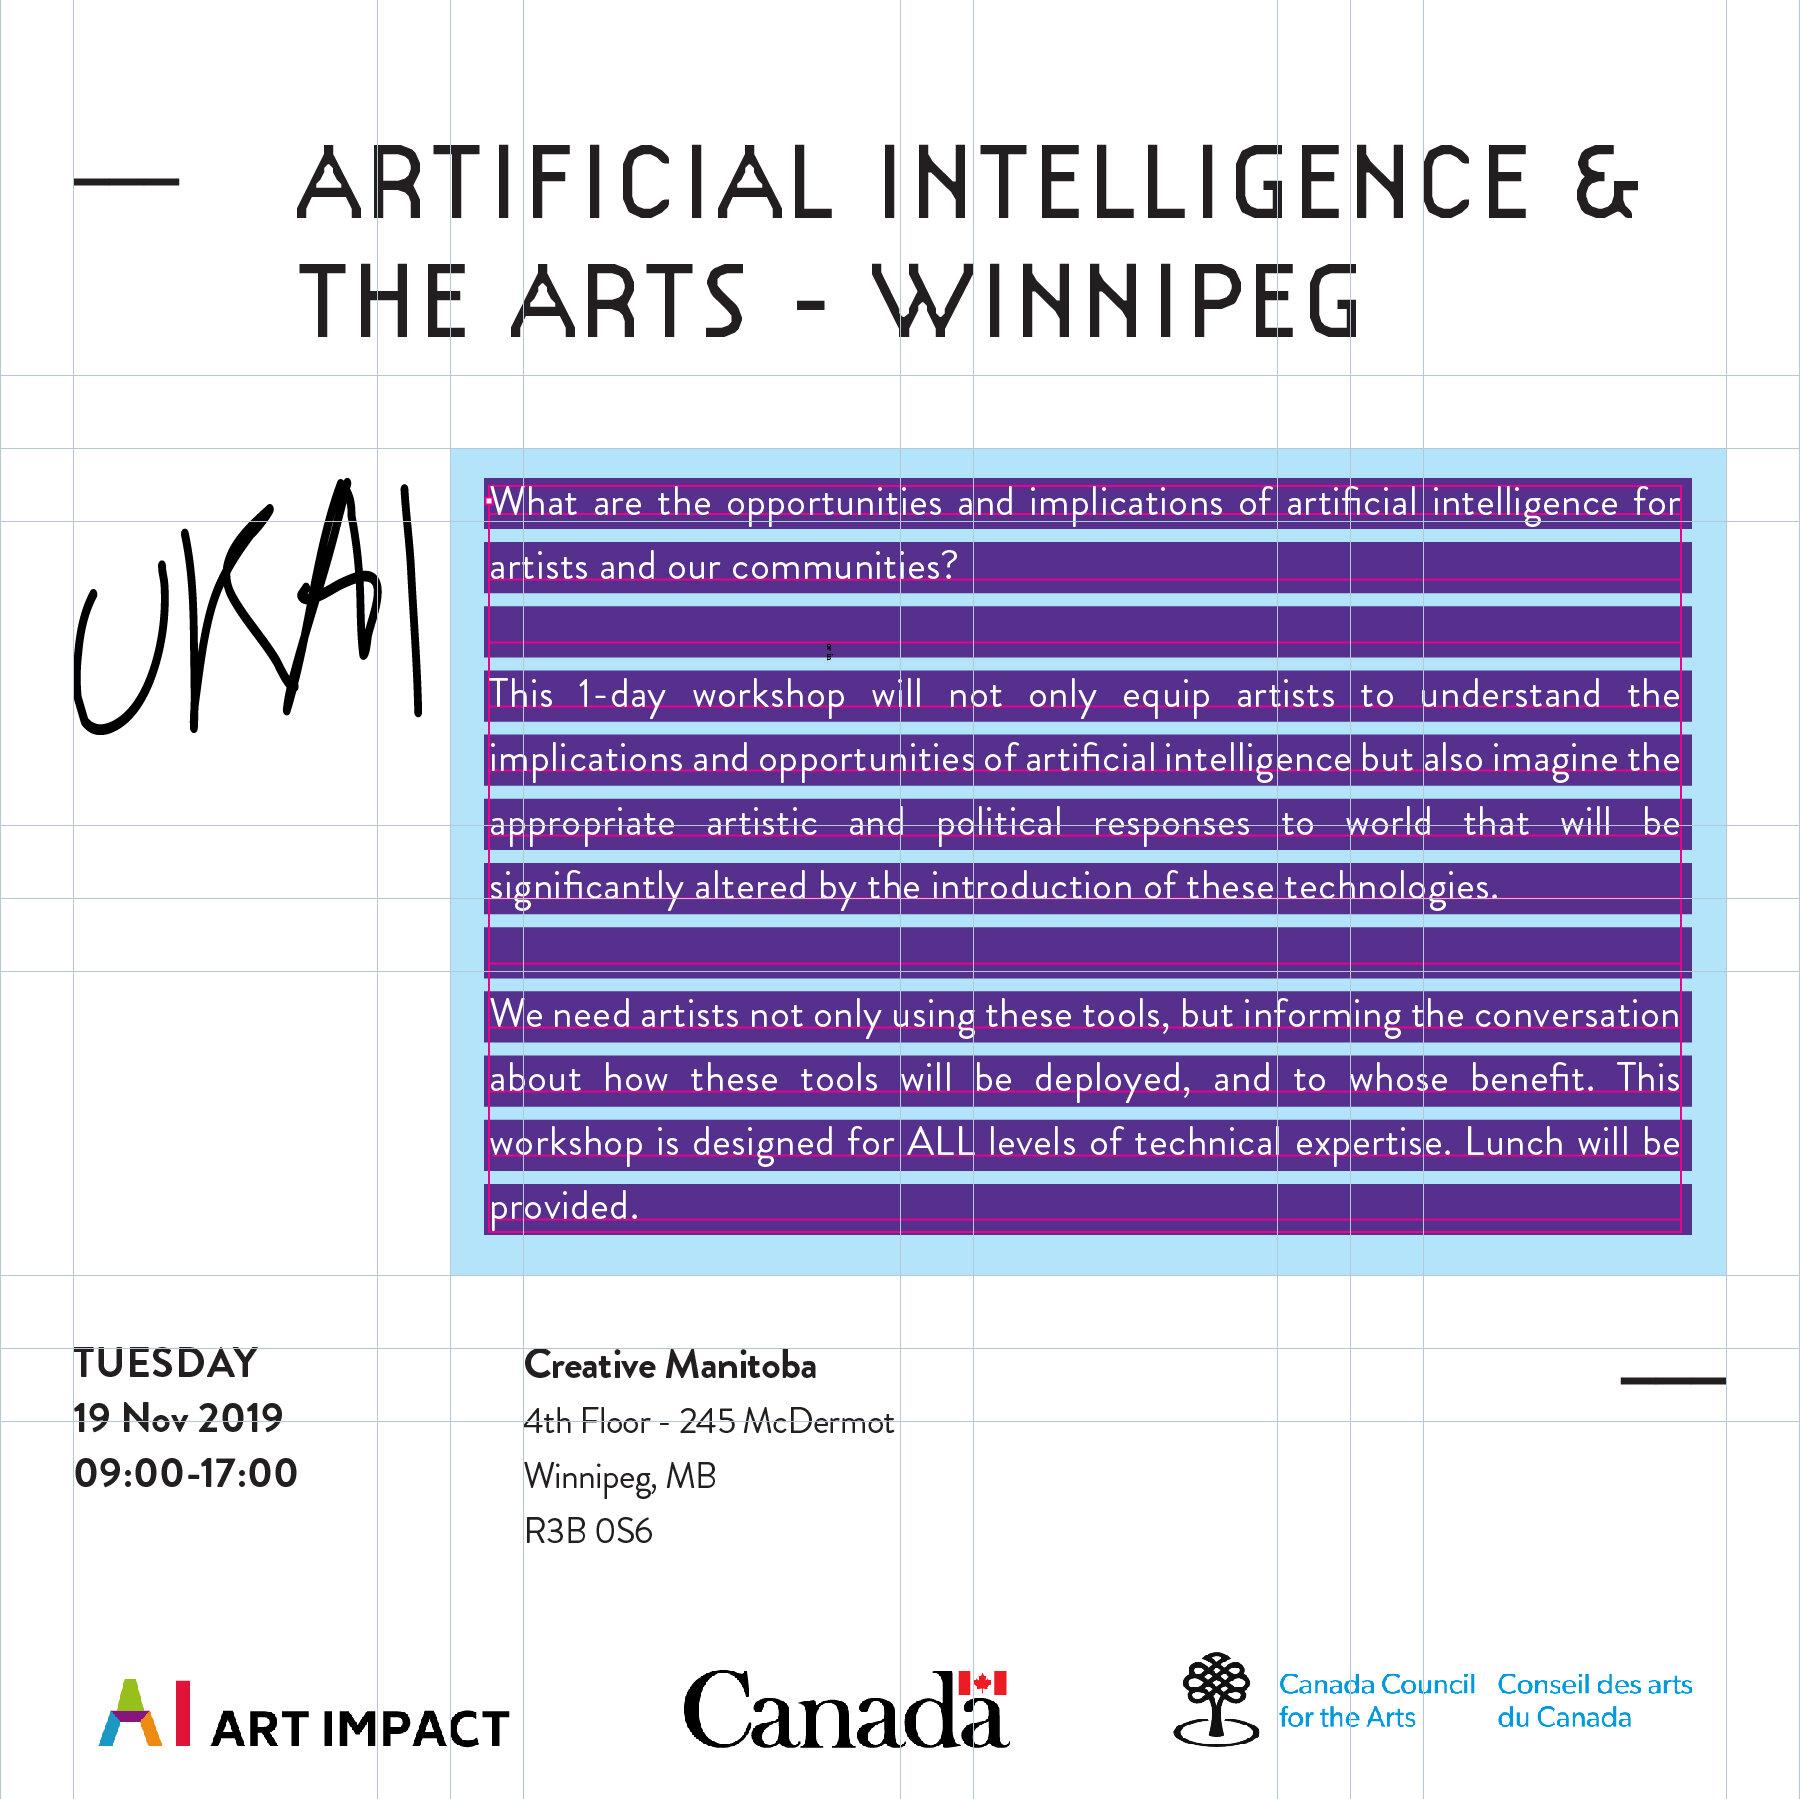 Artificial Intelligence and the Arts - Winnipeg